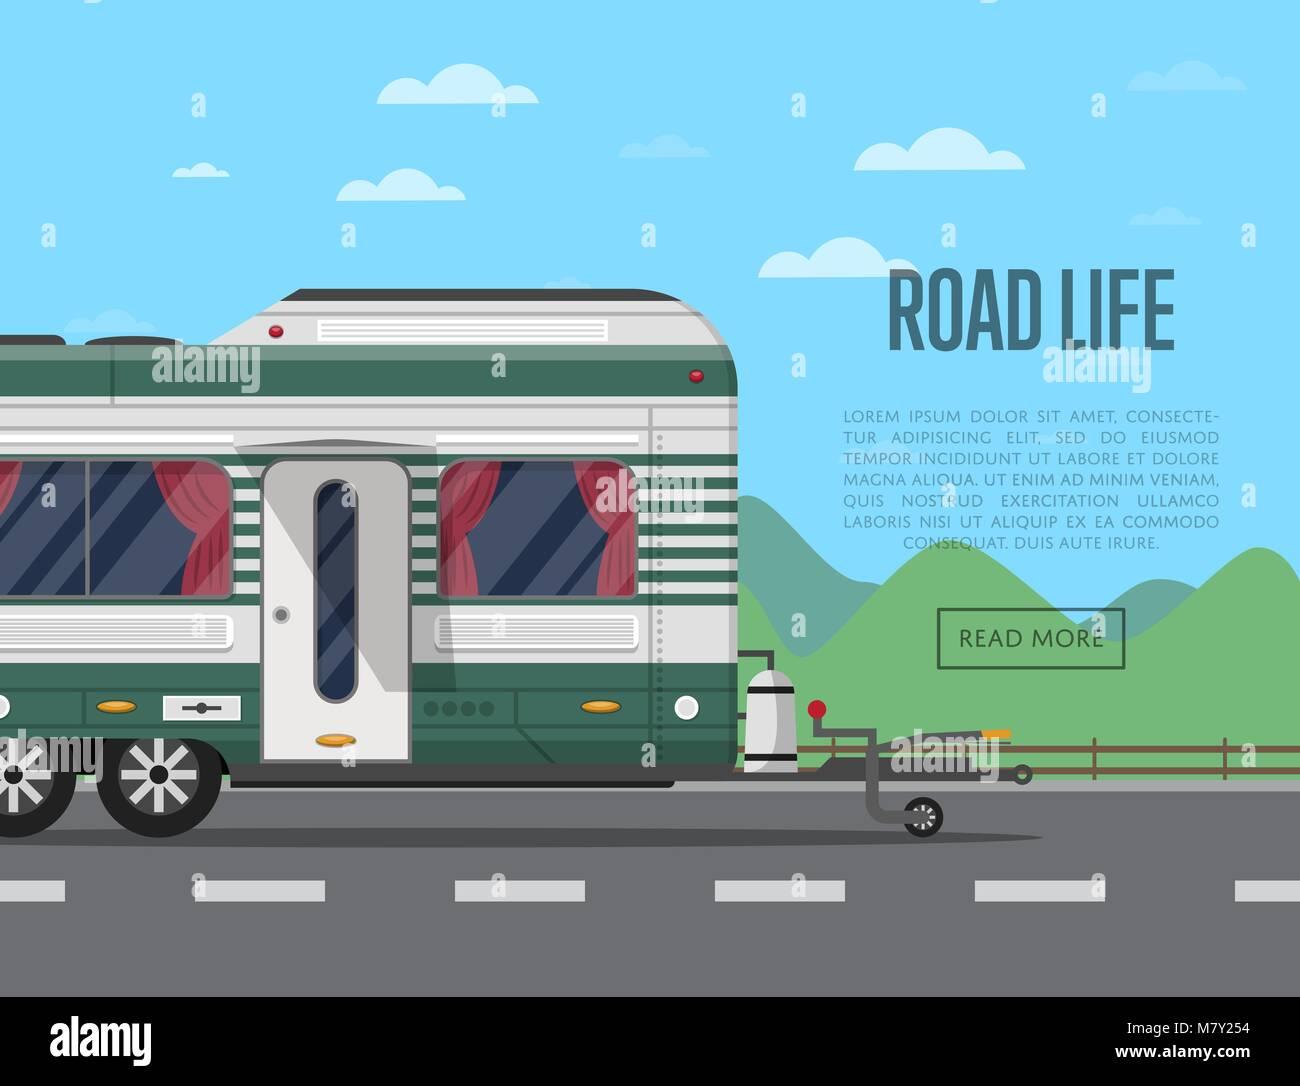 Trailer Park Life Stock Vector Images - Alamy on small town life, carnival life, beach life, trailer trash family, family life, bar life,